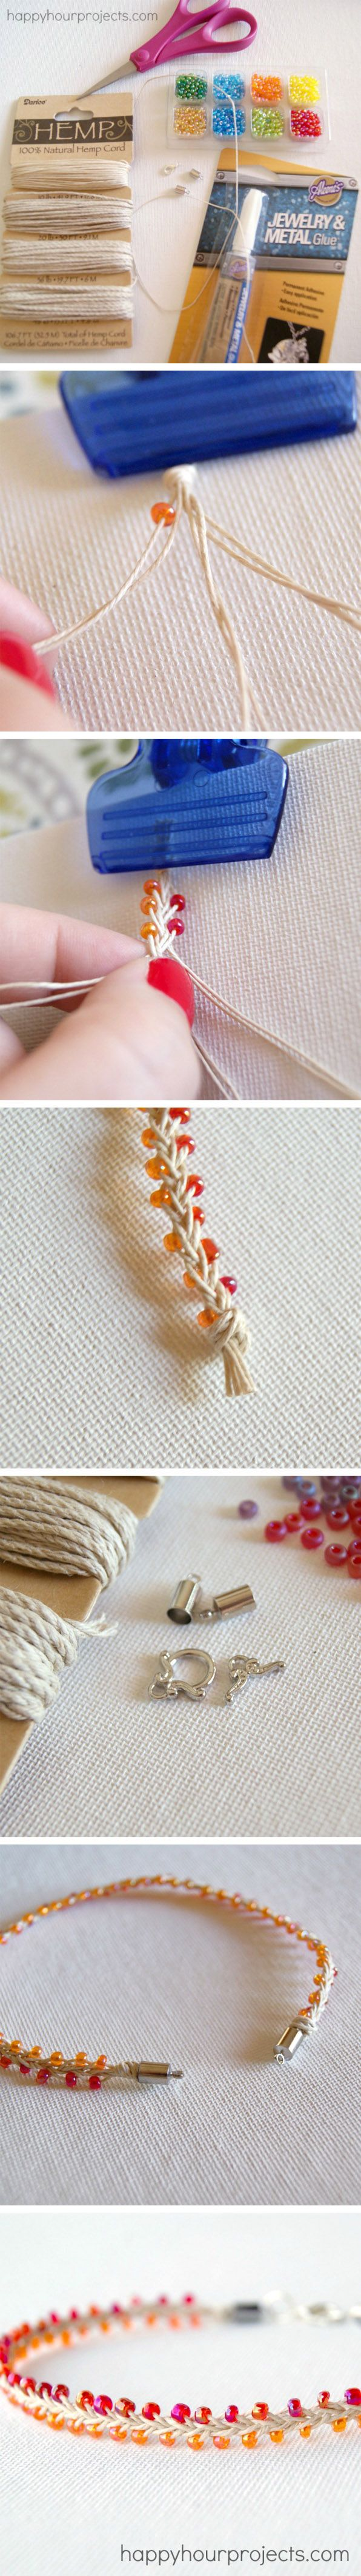 Tressage avec perles